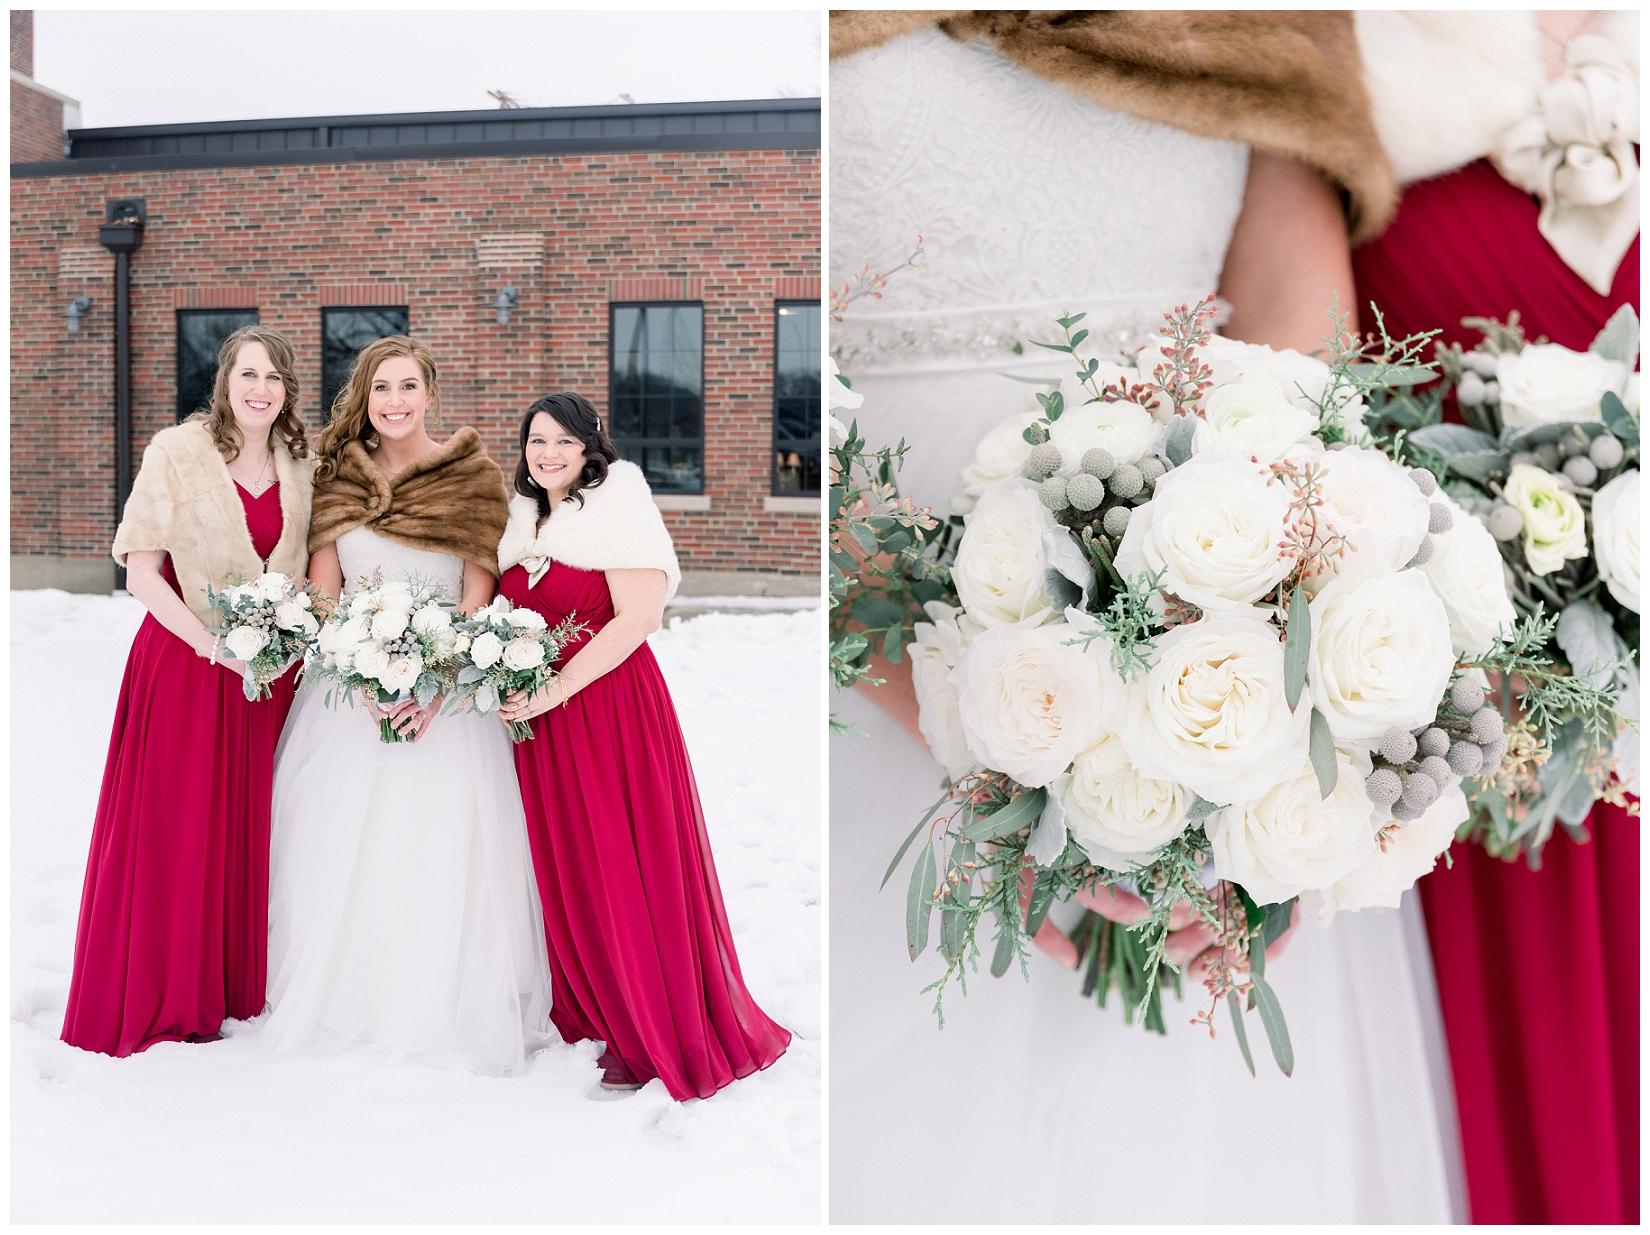 cat-alkire-wedding-photographer-indiana-chicago-indianapolis-fort-wayne_0958.jpg